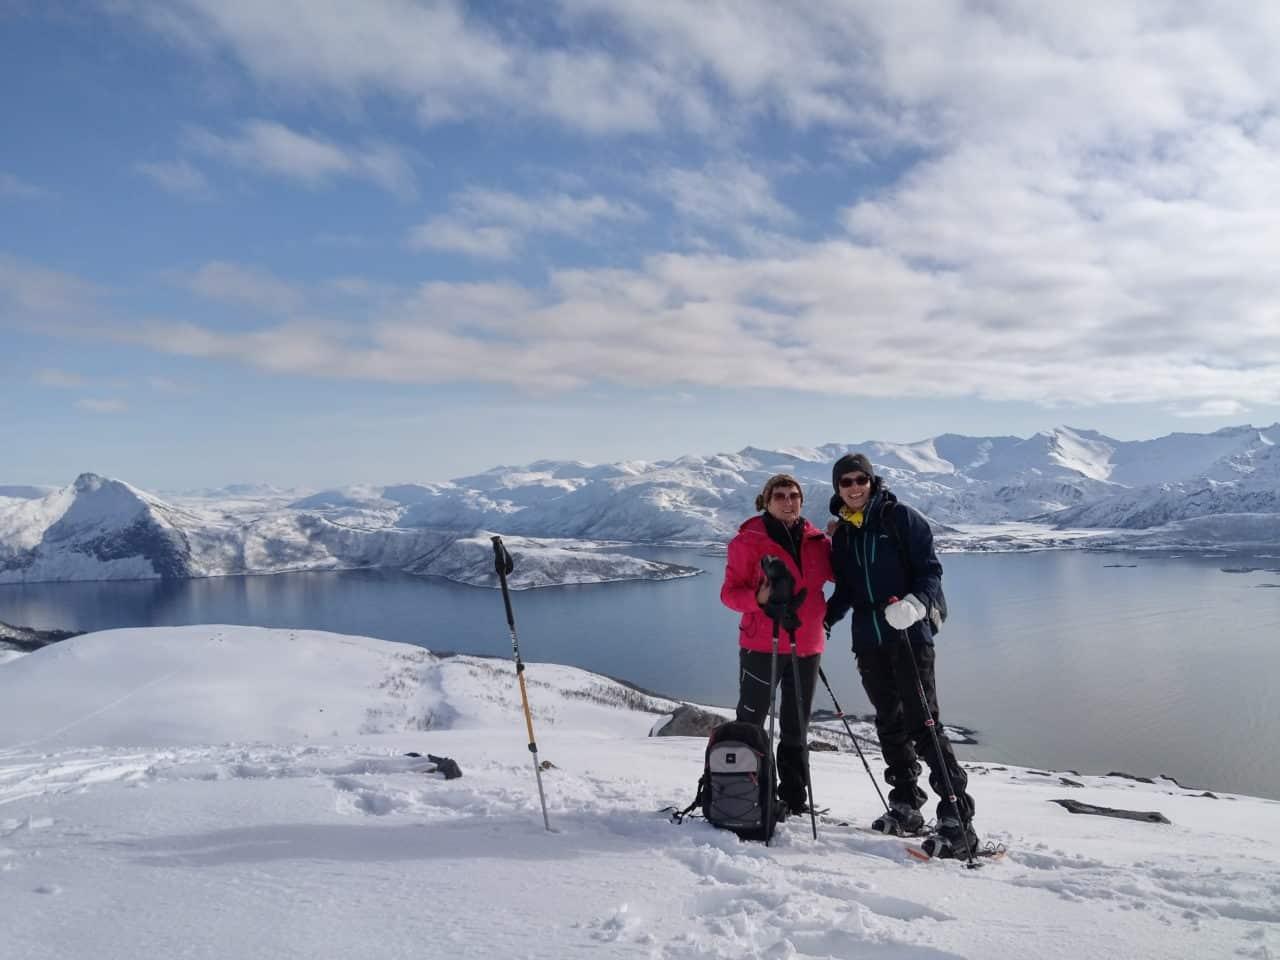 Hamn in Senja en face, Skaland avec Silvana Carrard, accompagnatrice chez Helyum.ch